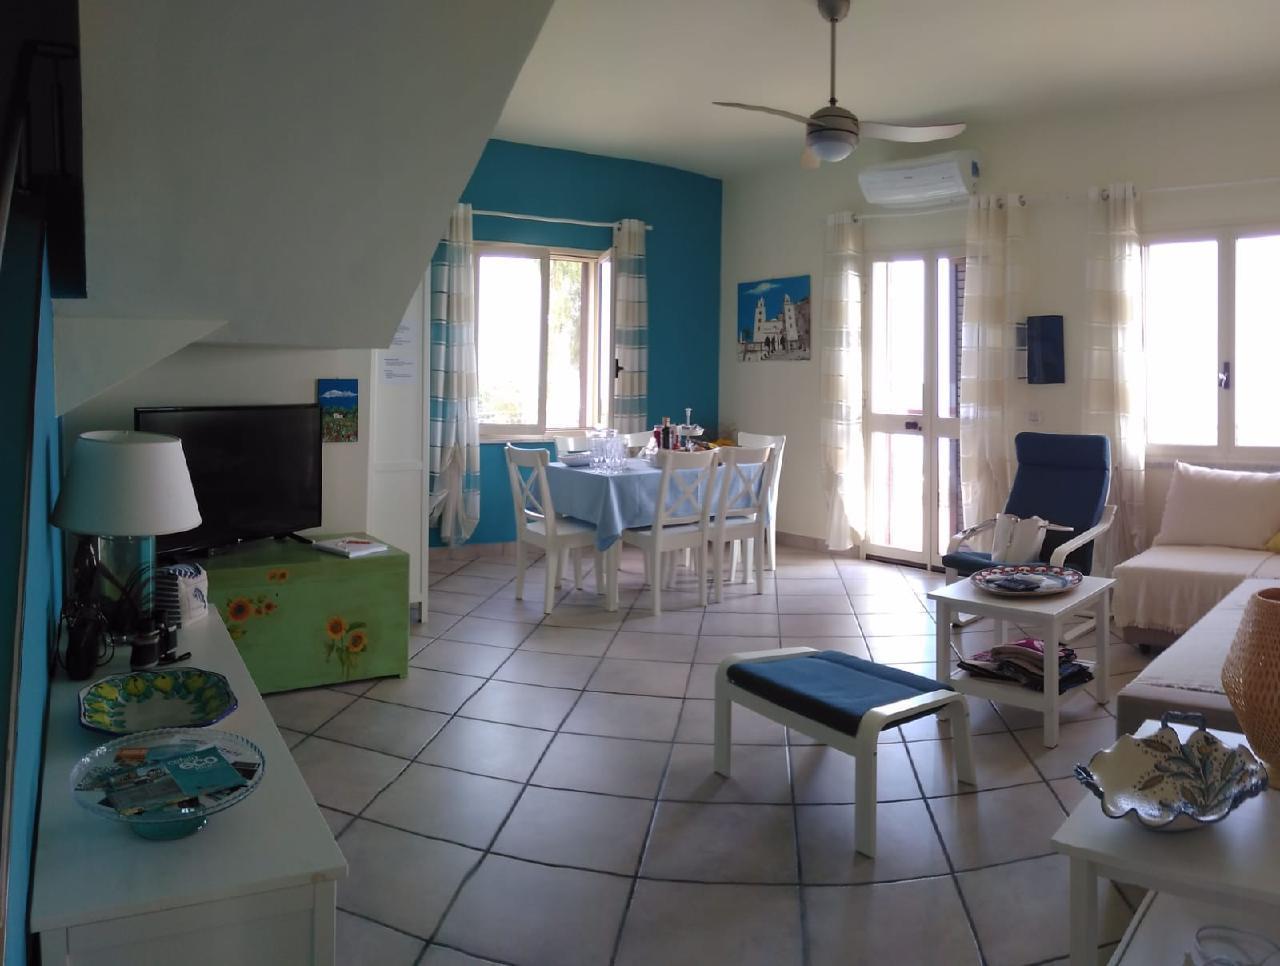 Maison de vacances Villa Le Terrazze Cefalù - Wunderschönes Haus mit Meersicht/Last-Minute Rabatt -30% (2620633), Cefalù, Palermo, Sicile, Italie, image 17